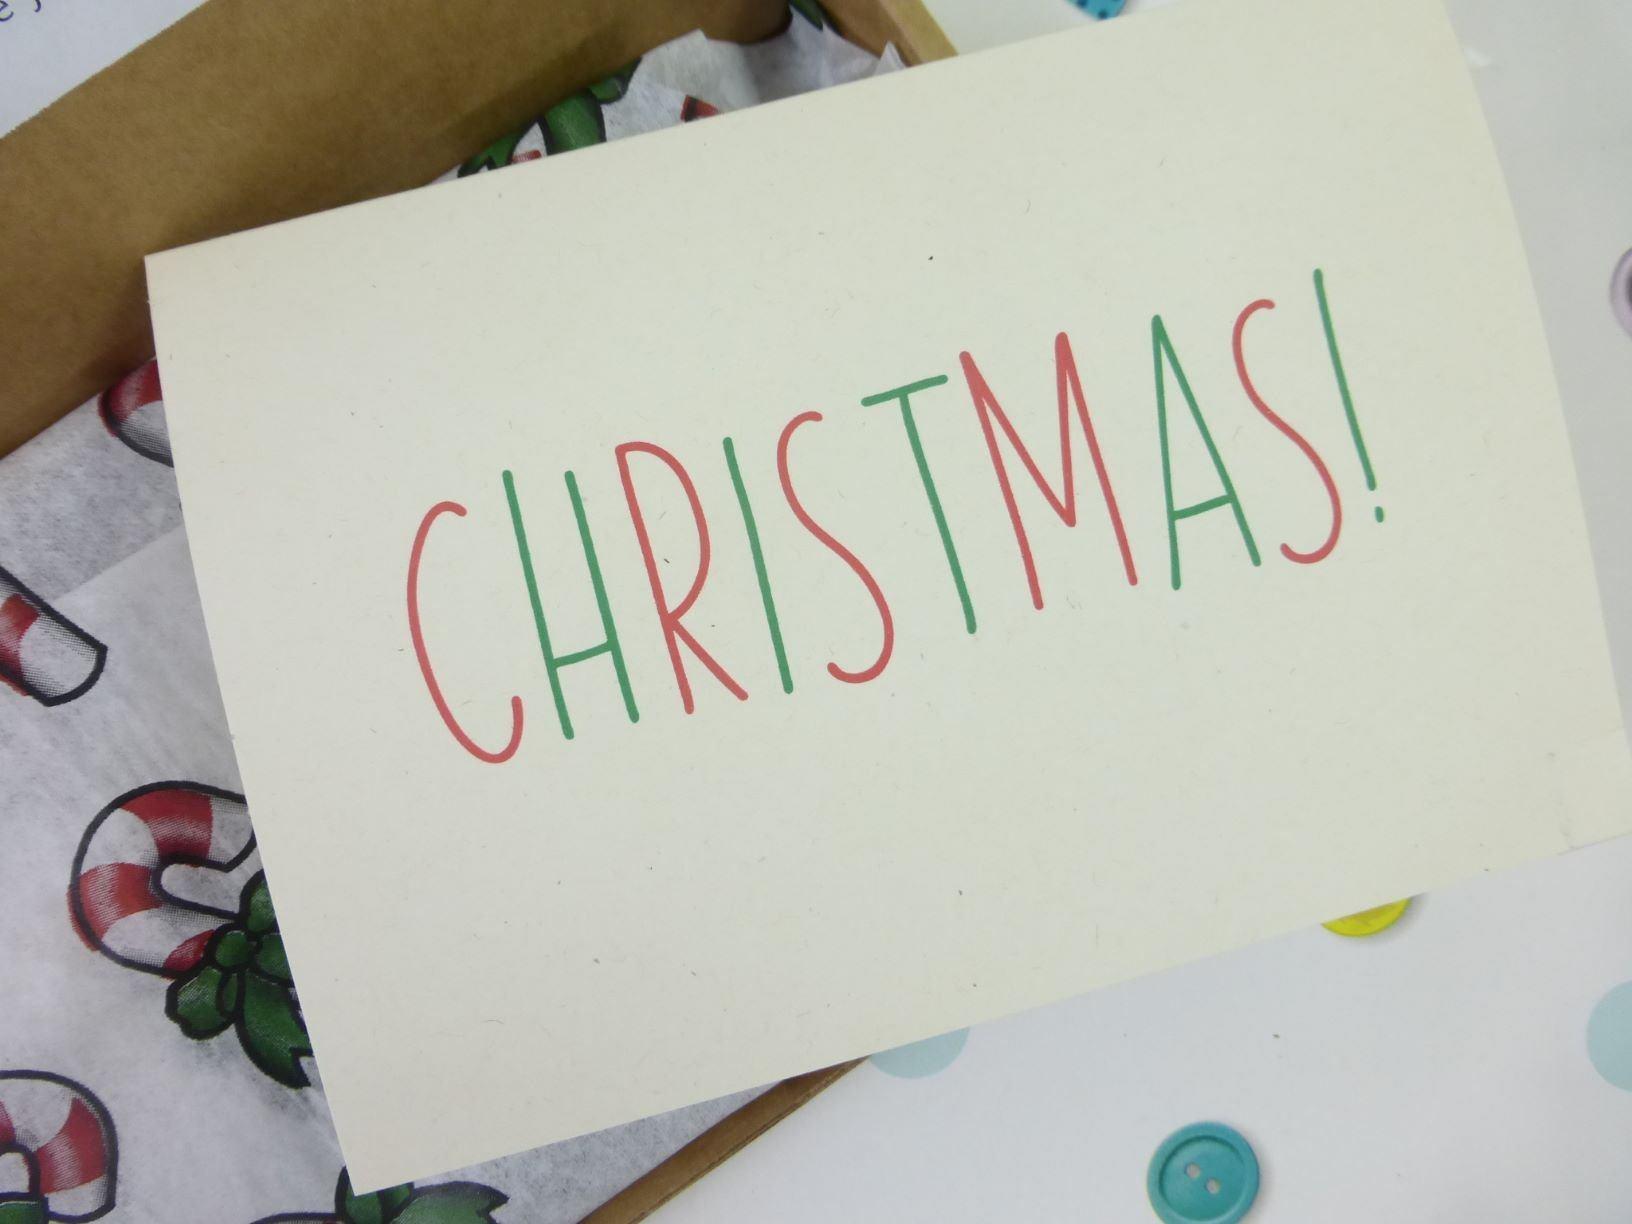 Christmas Stars, Letterbox Friendly, Pick Me Up Gift – The Smile Parcel Mini Kind Shop 3